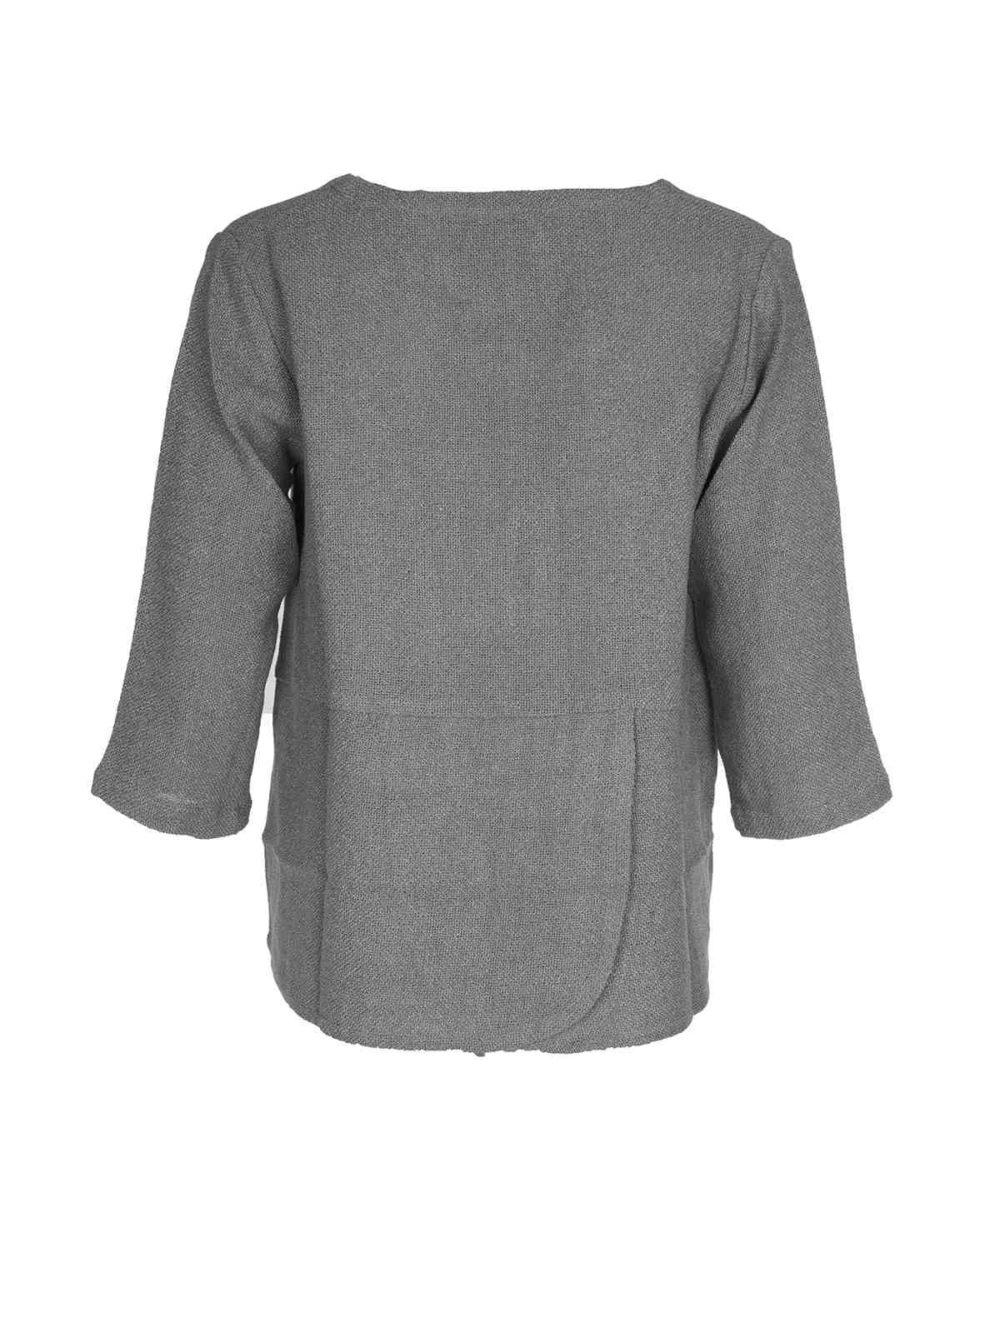 MA1387 Banuni Top Grey